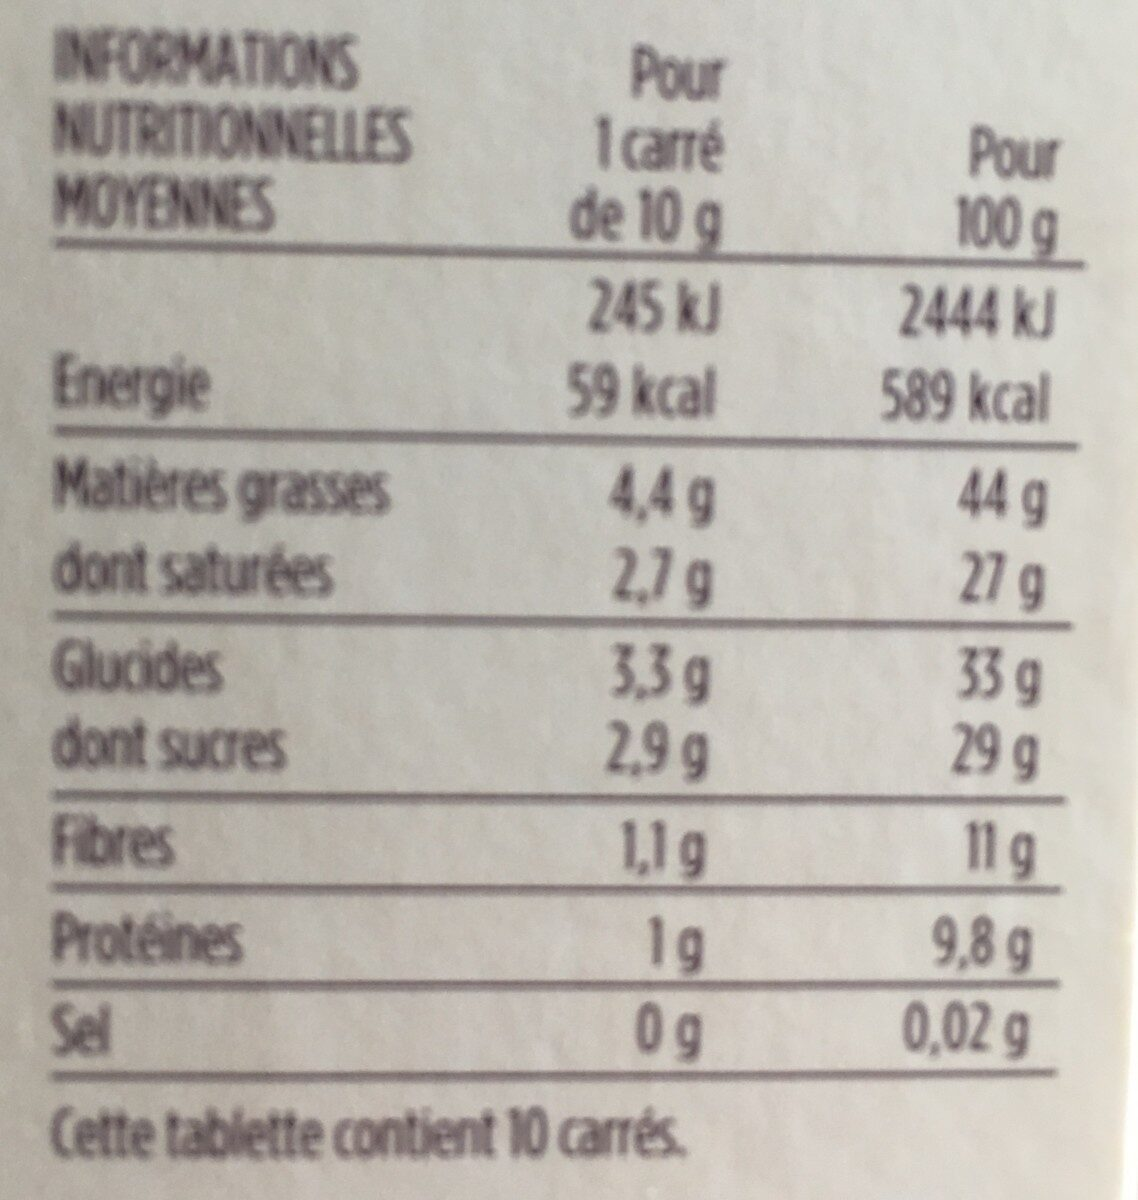 Chocolat noir 72% de cacao Saint-Domingue - 营养成分 - fr